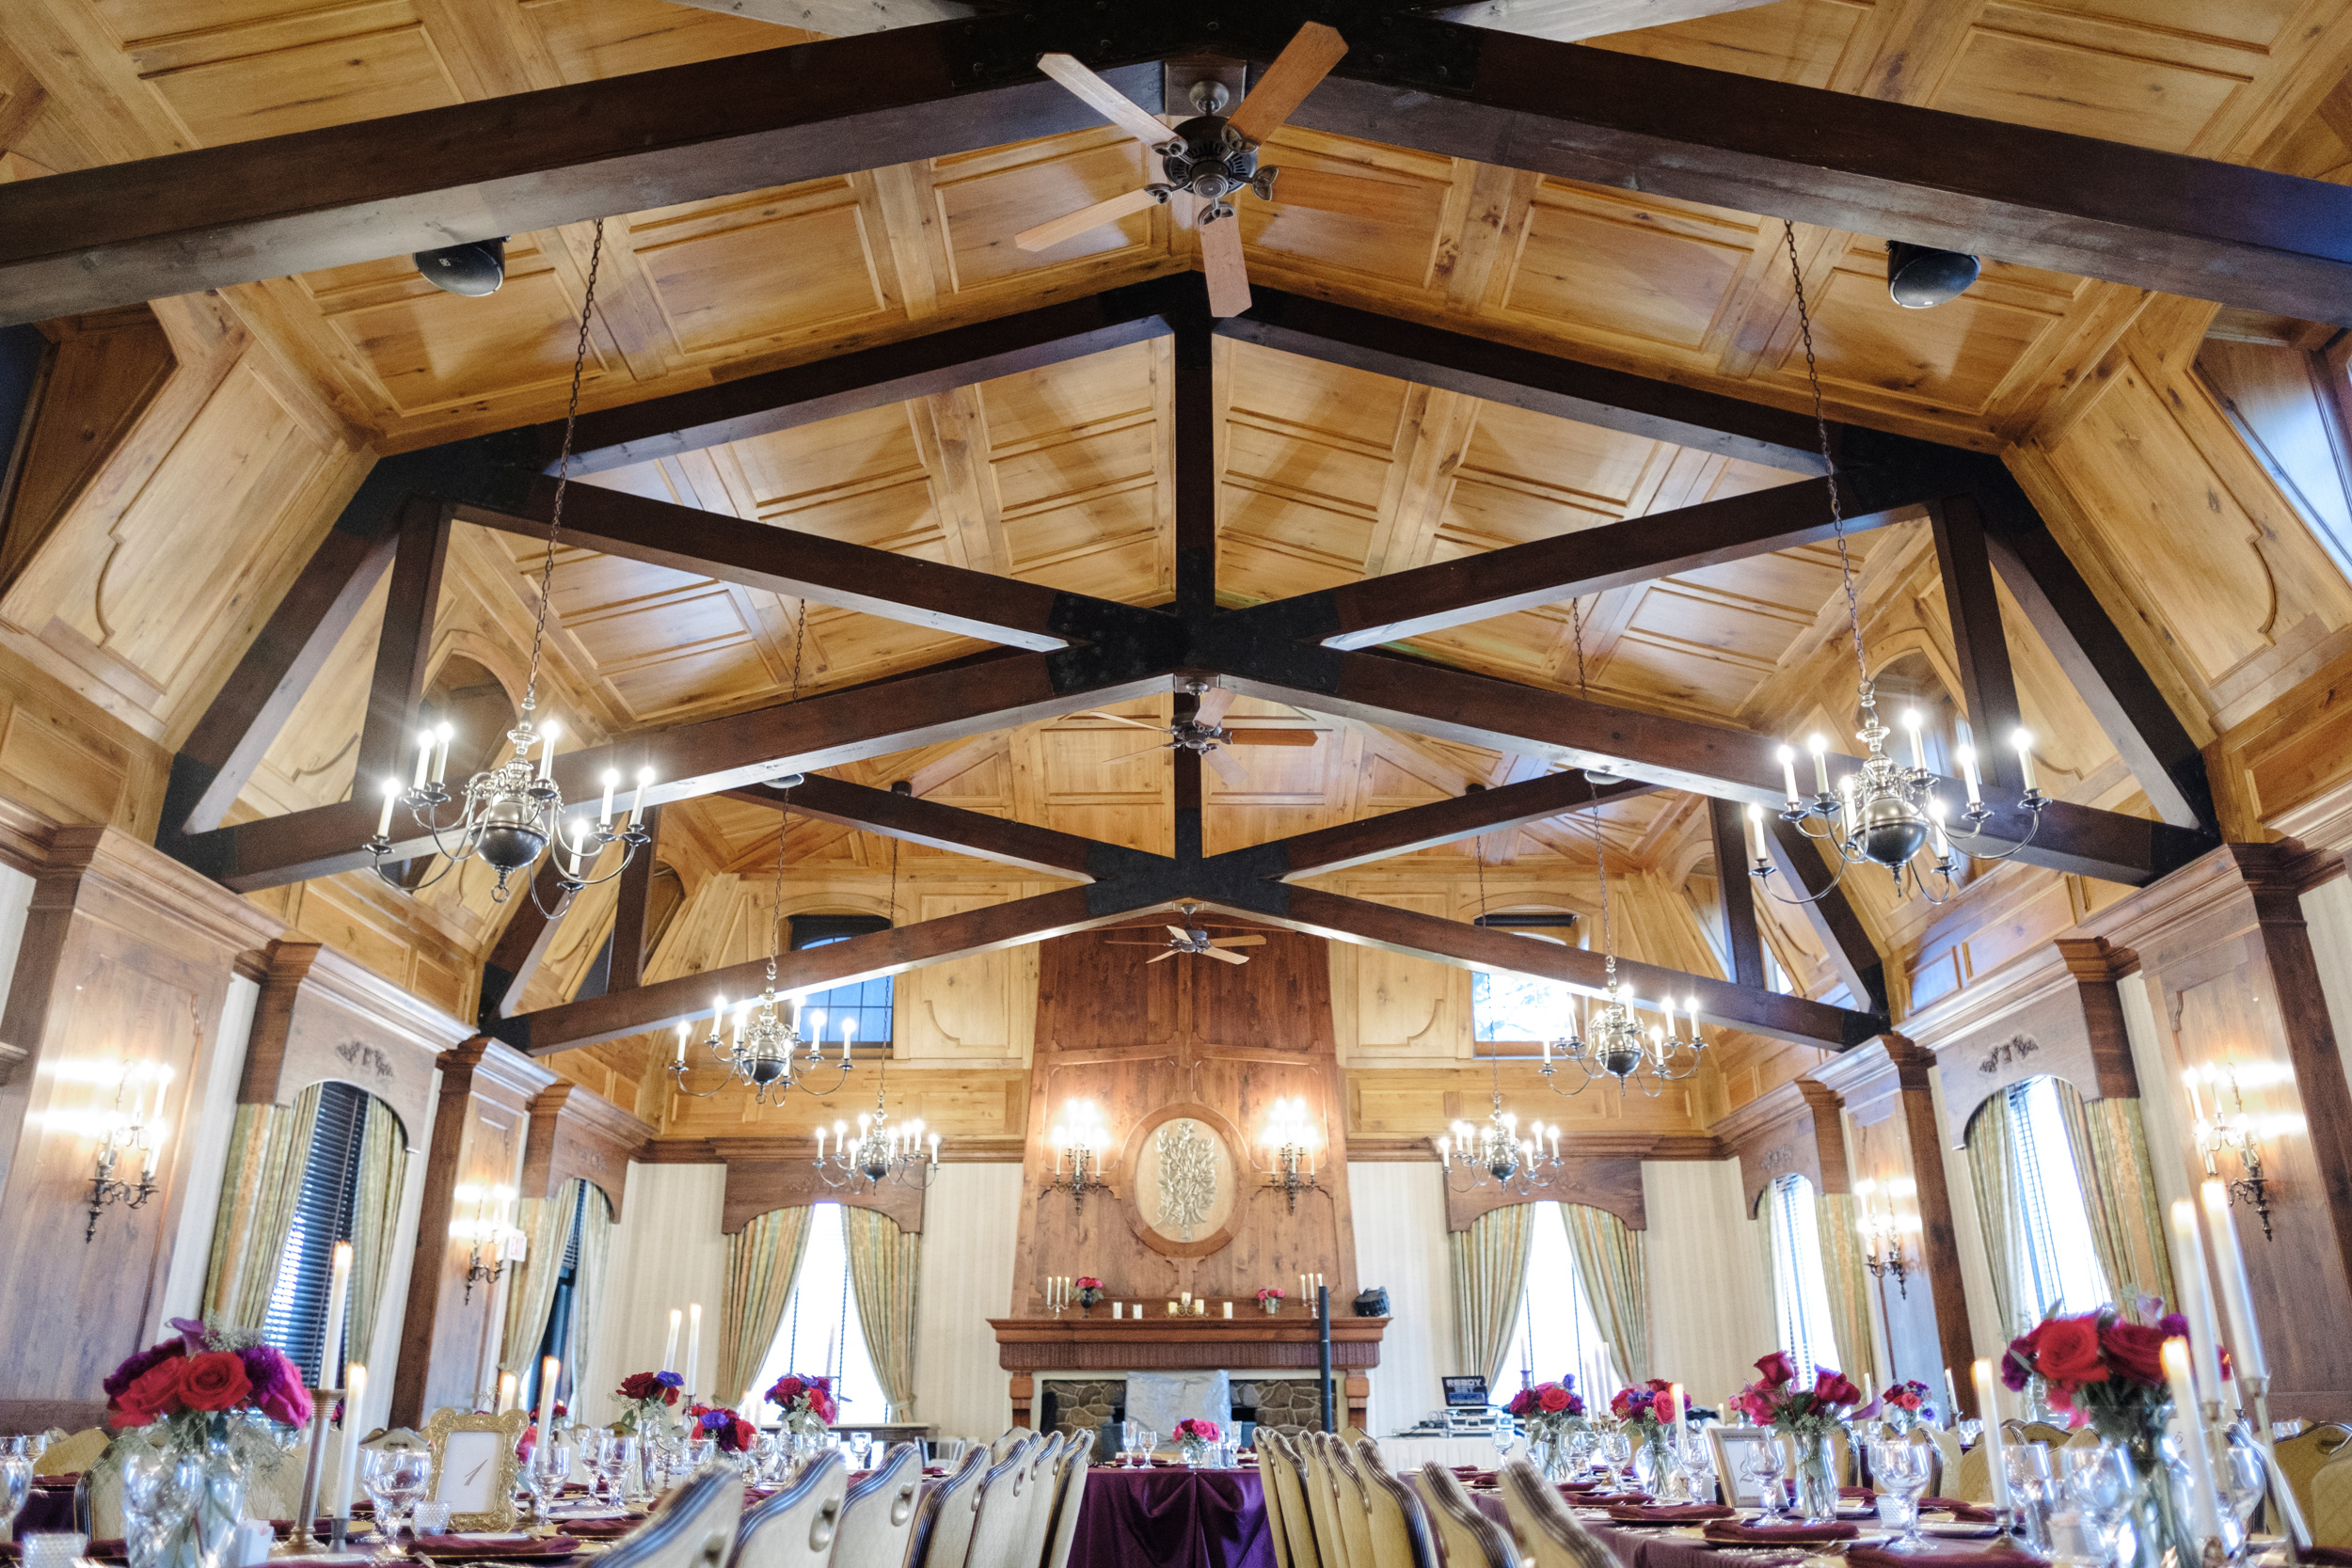 Cog Hill golf club main hall decorated for a wedding